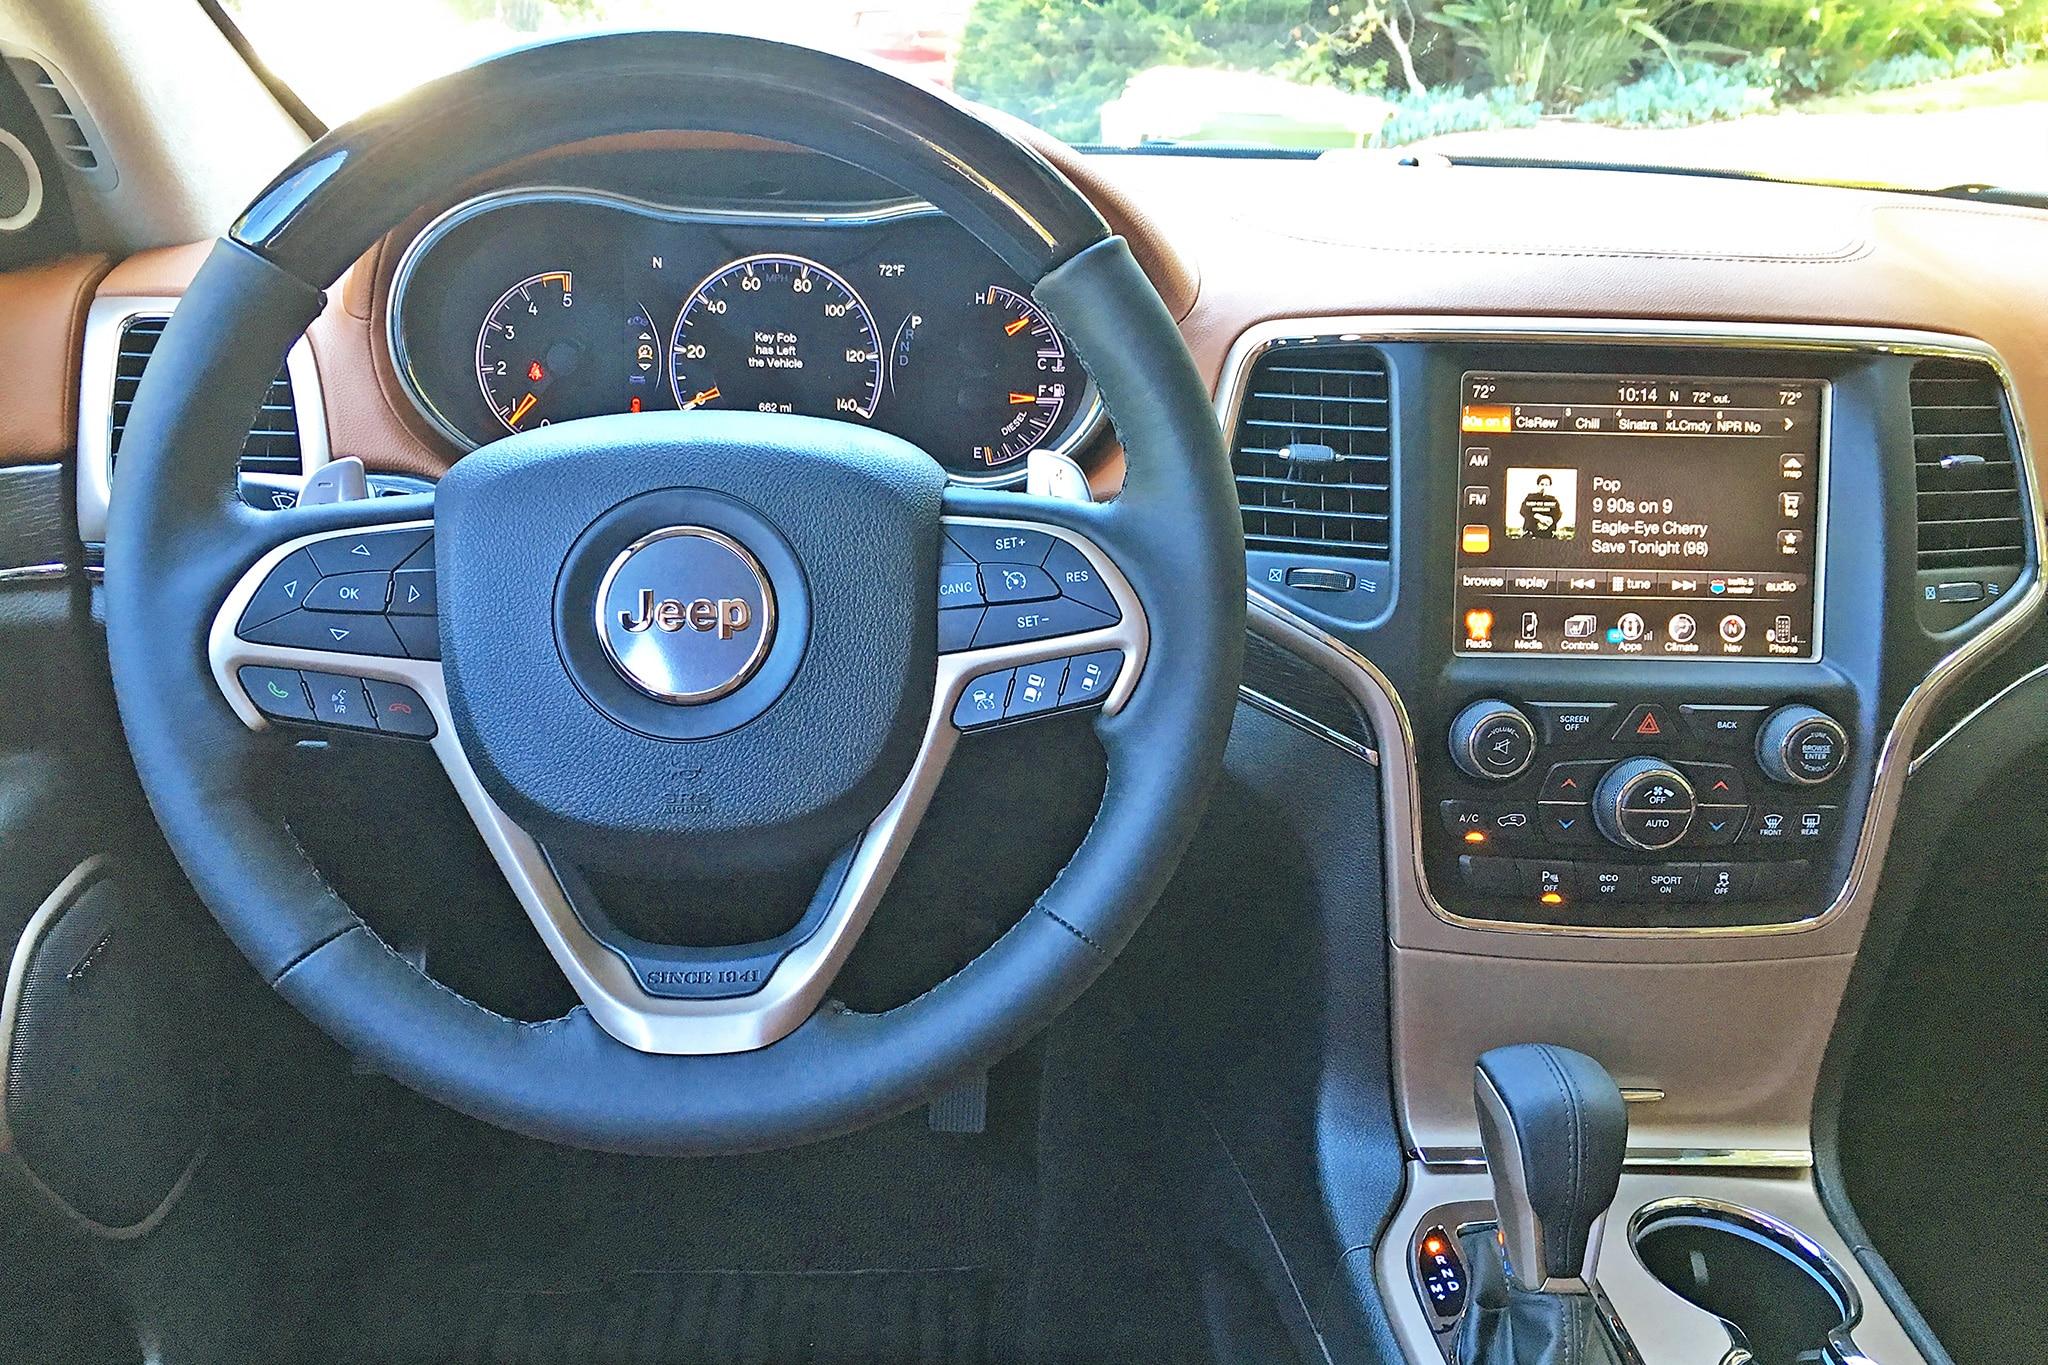 2016 Jeep Grand Cherokee Summit EcoDiesel One Week Road Test and